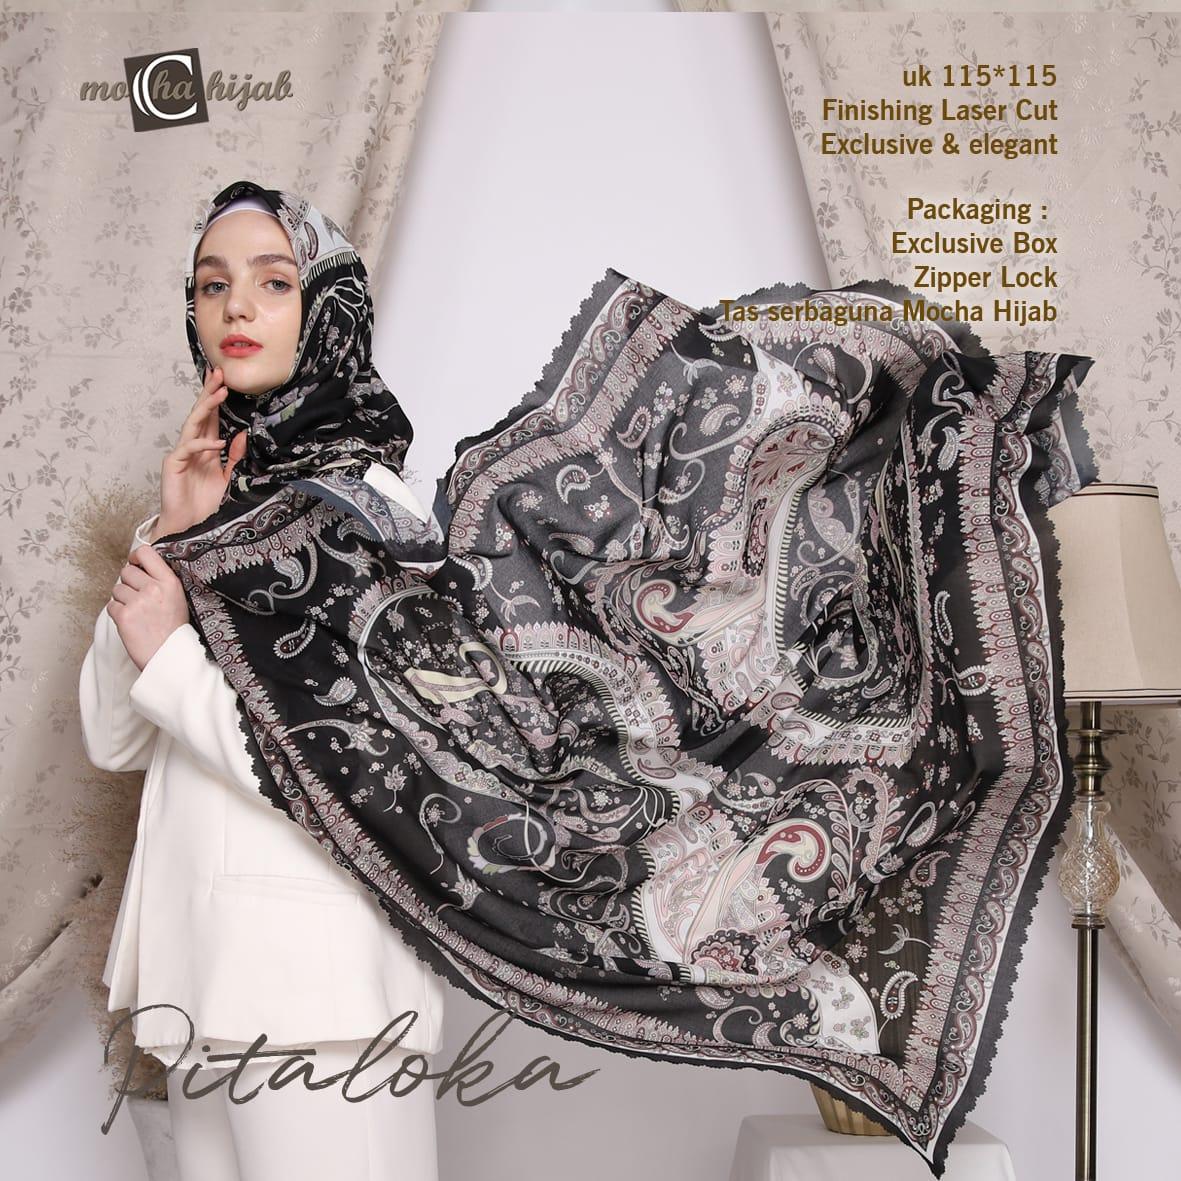 Hijab Premium high quality harga bersahabat, motif banyak pilihan #Hijabindonesia #Hijabers #Hijabmuslimah #Hijabcantik #Hijabmodern #Fashionhijab #jilbabcantik #hijabsolehah #Hijabsquare #Hijabmotif https://t.co/vR41hxD7cc